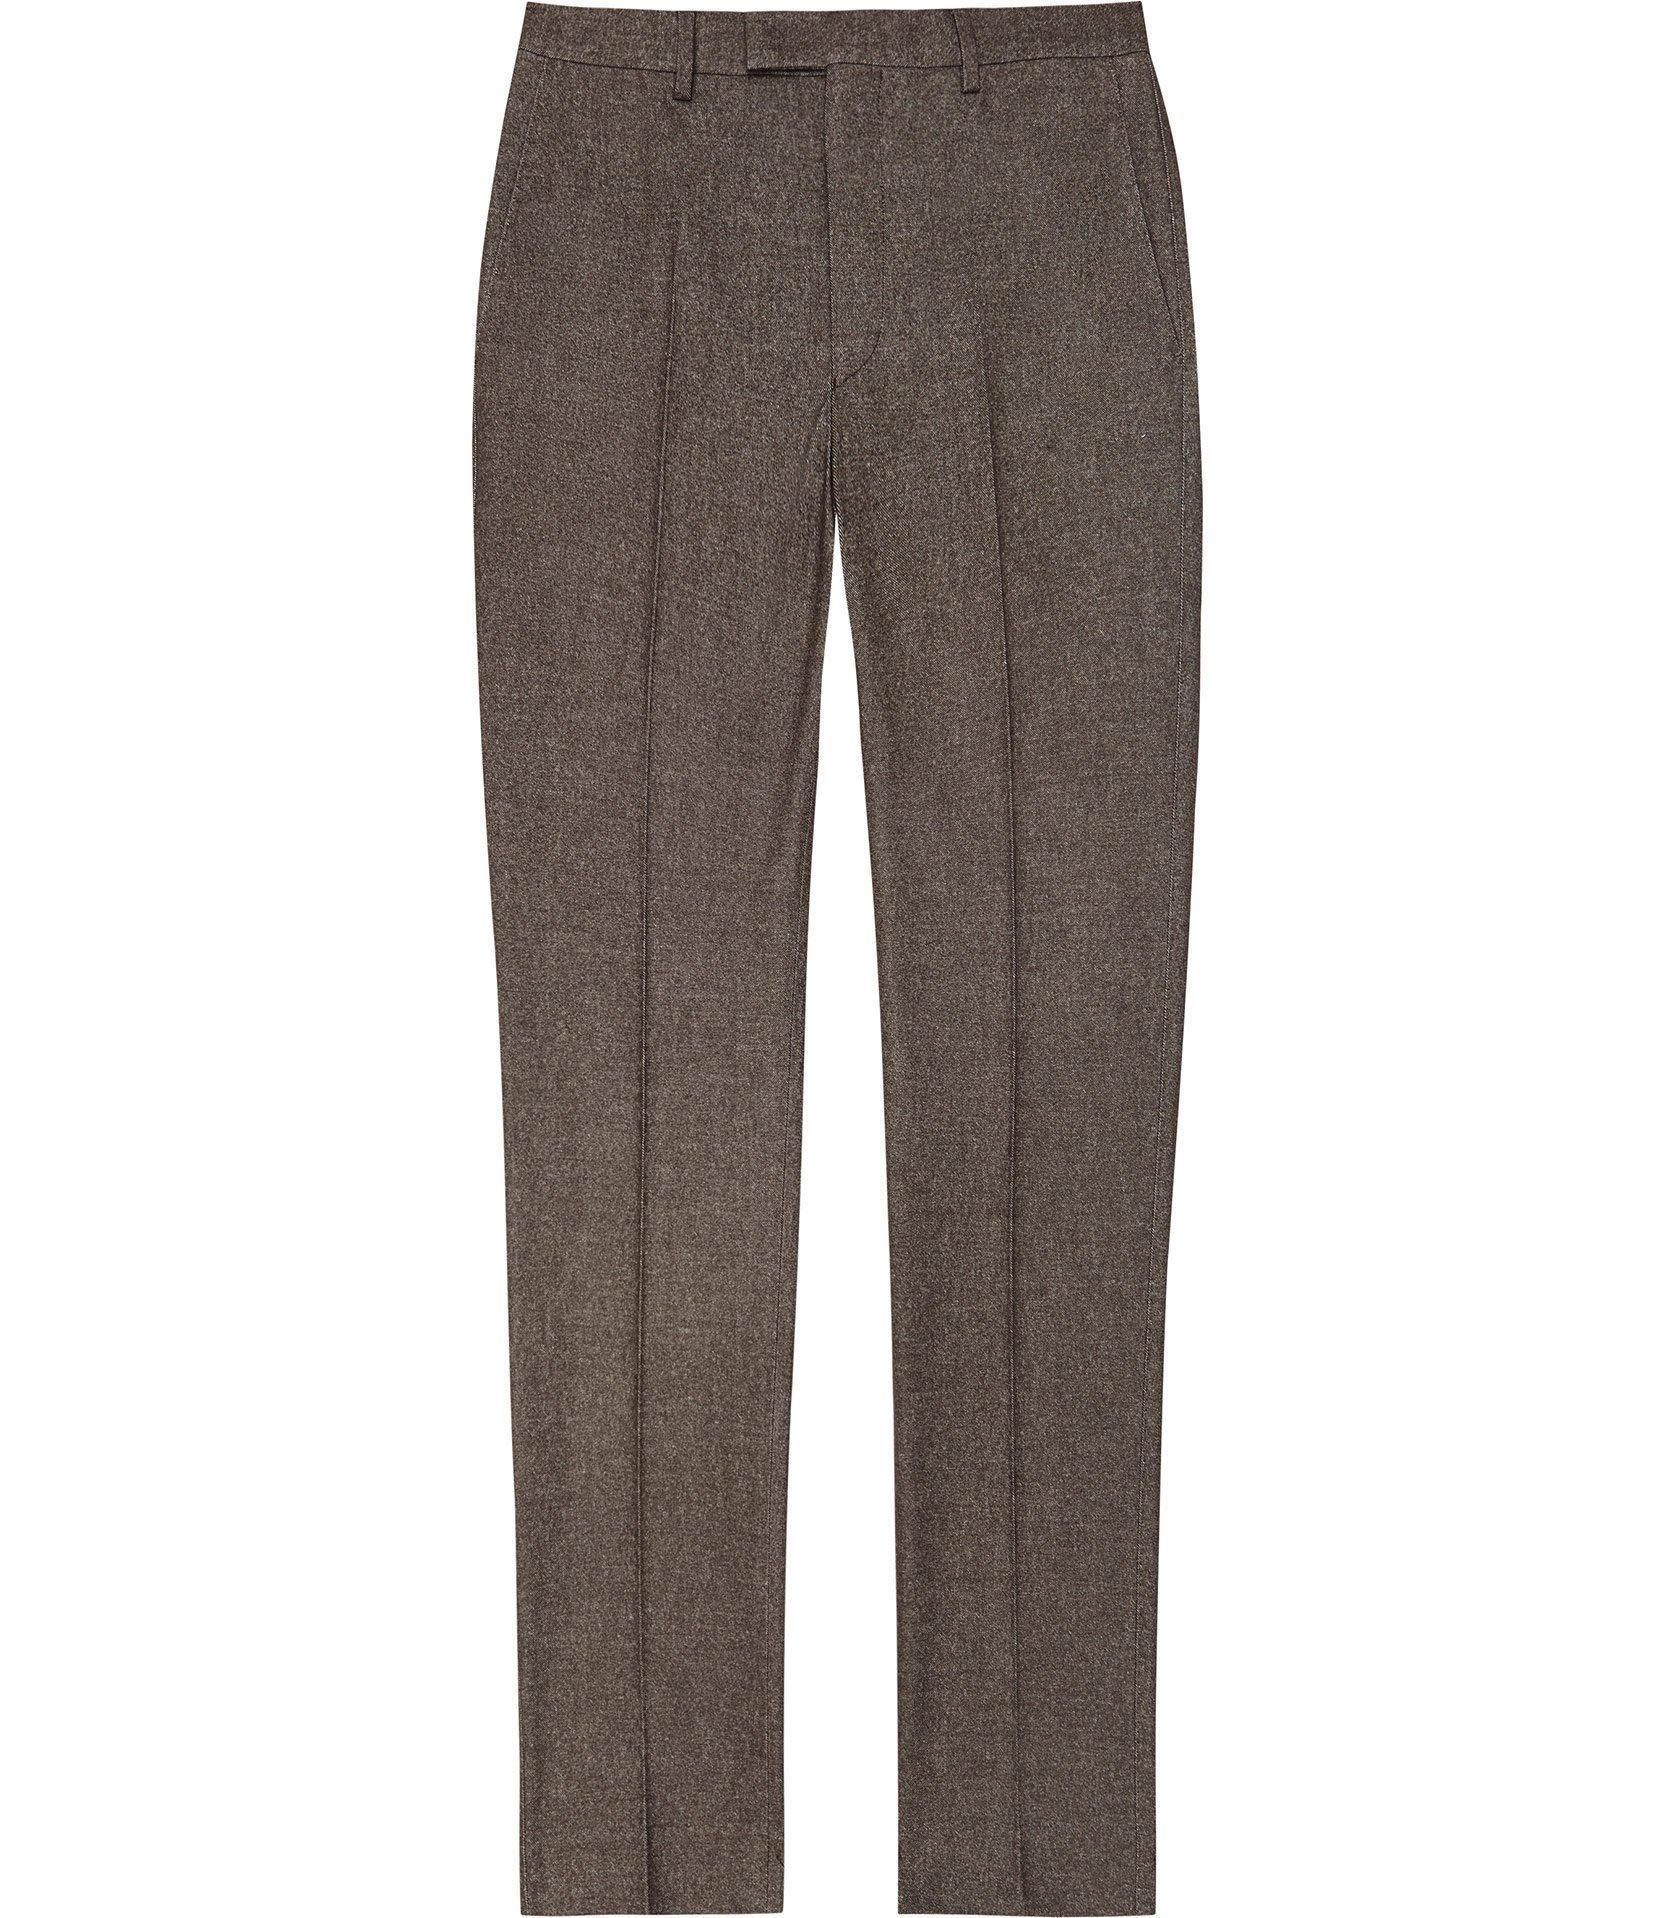 c0c6c5ff40d8 Reiss Quake - Slim Fit Brushed Cotton Trouser in Brown for Men ...